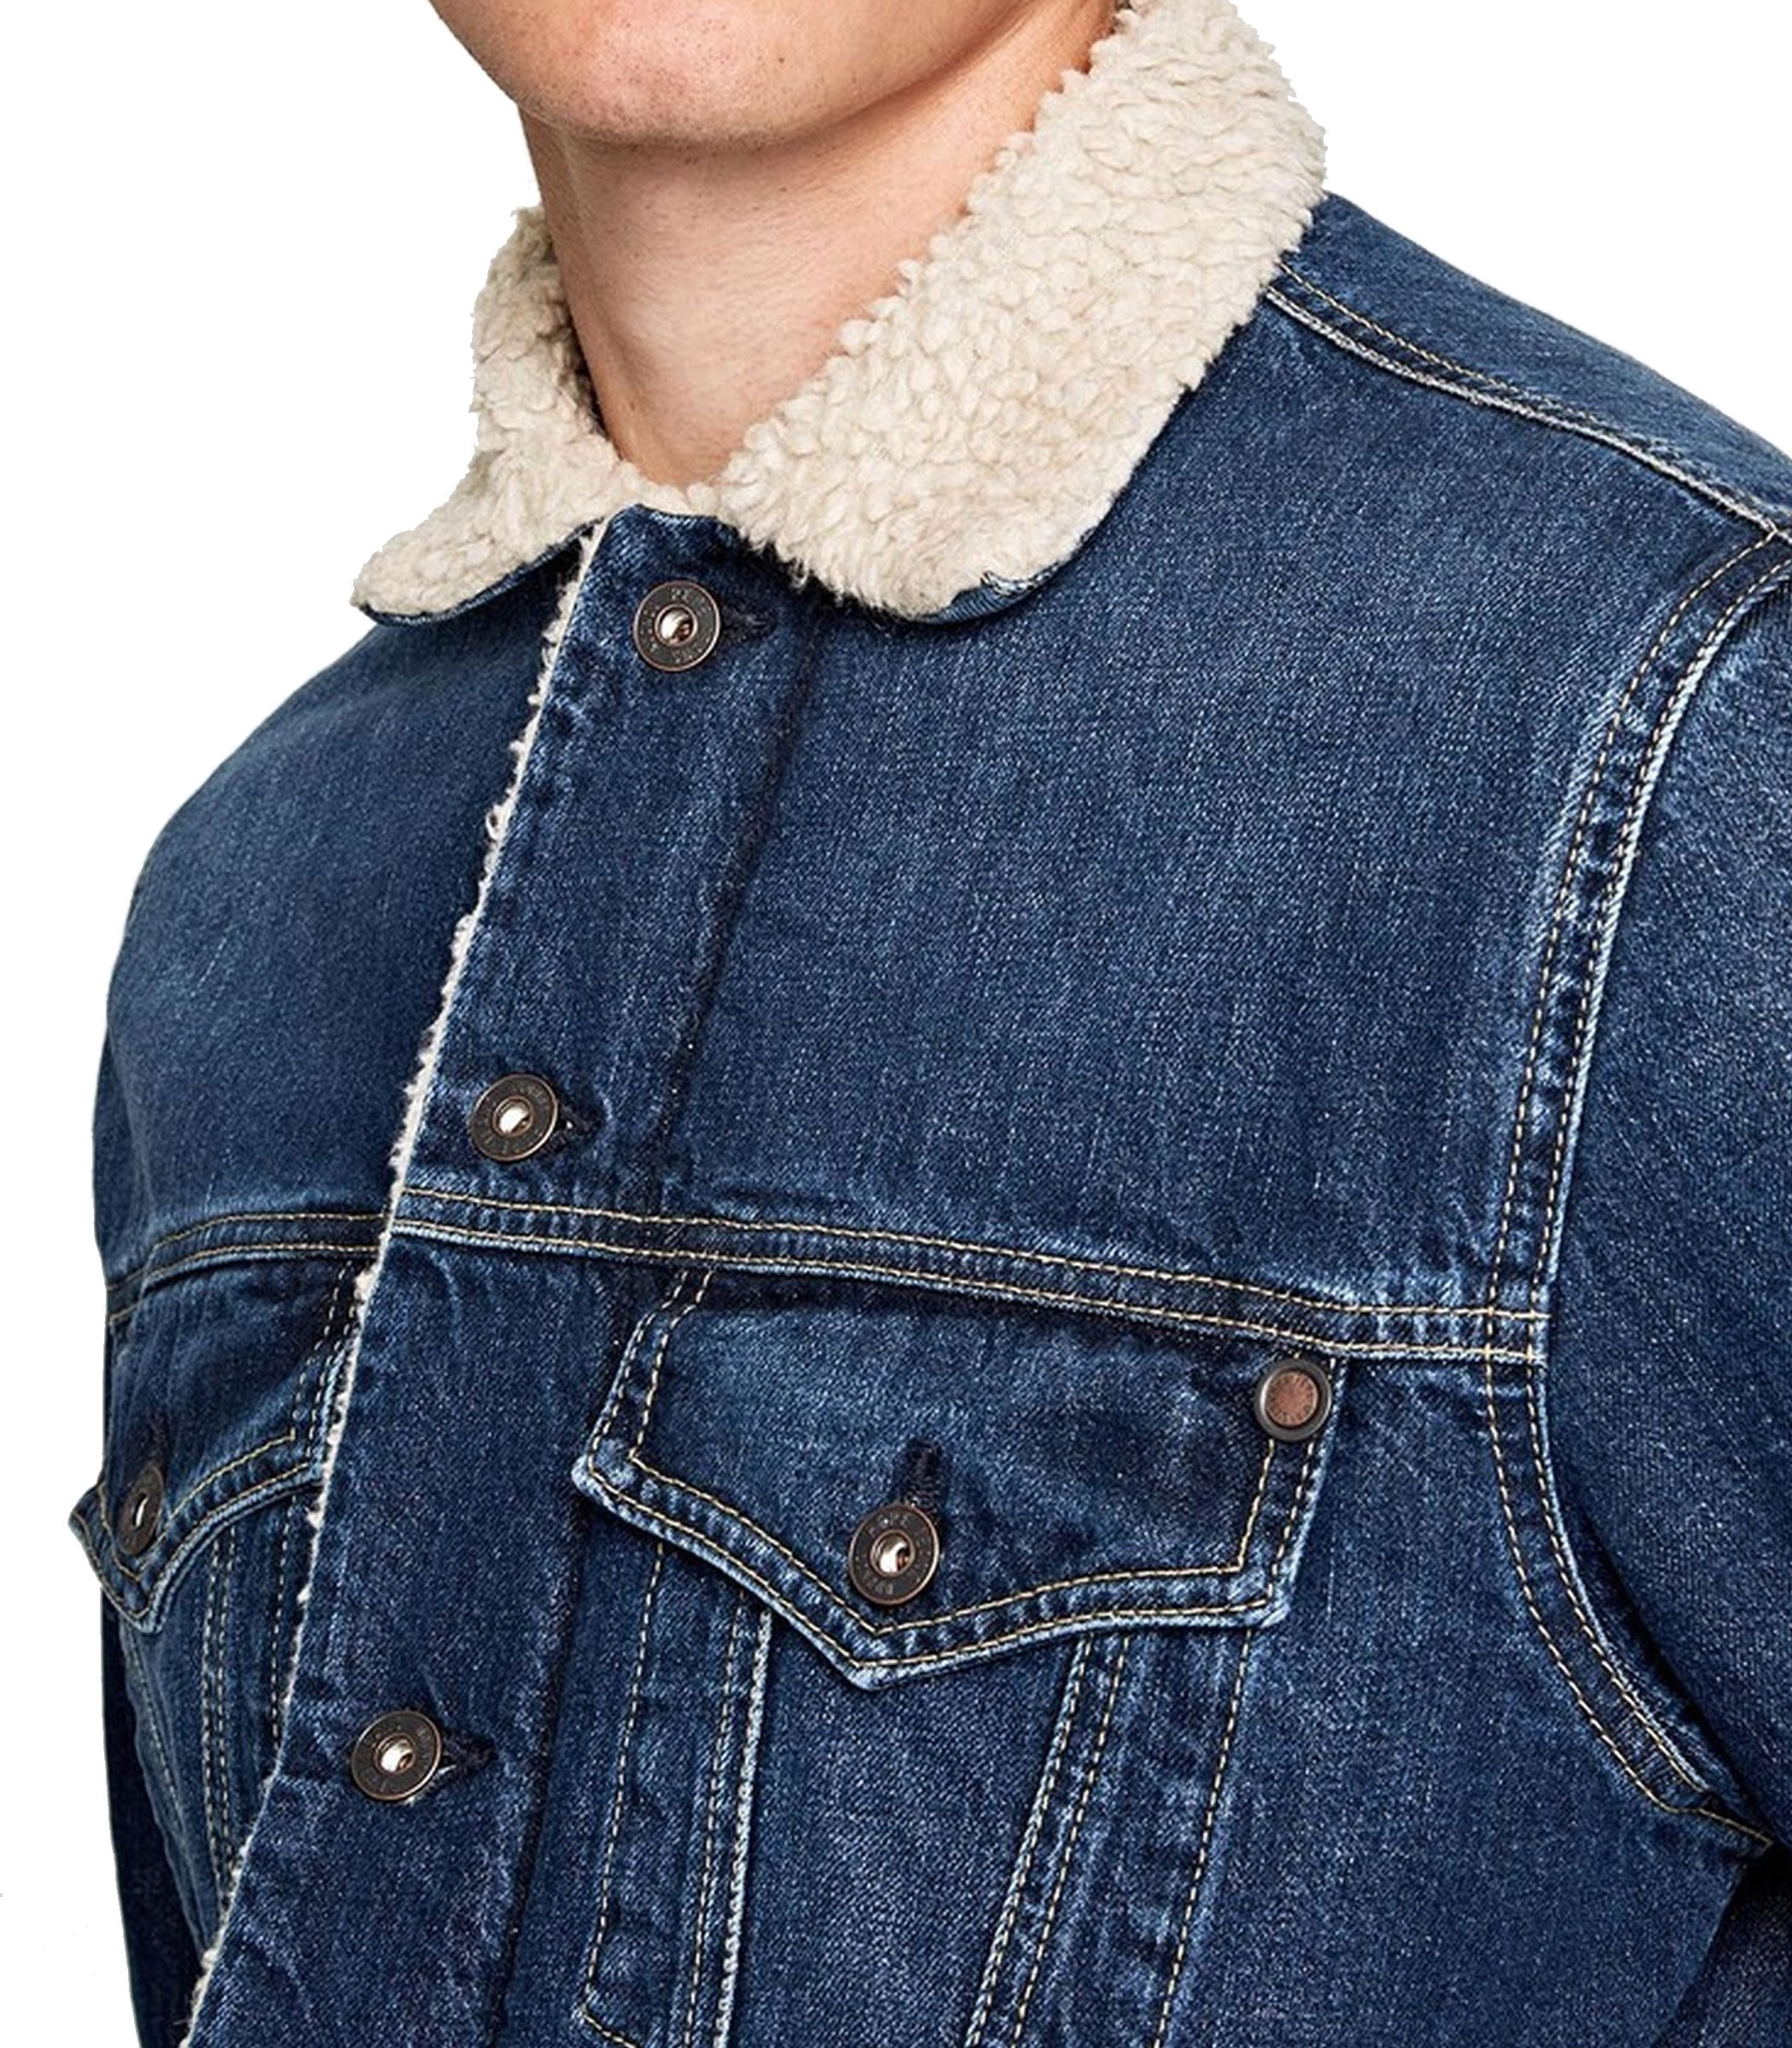 on sale 75ce1 ad1d3 Giubbotto Giacca Pepe Jeans imbottito in tessuto denim ...